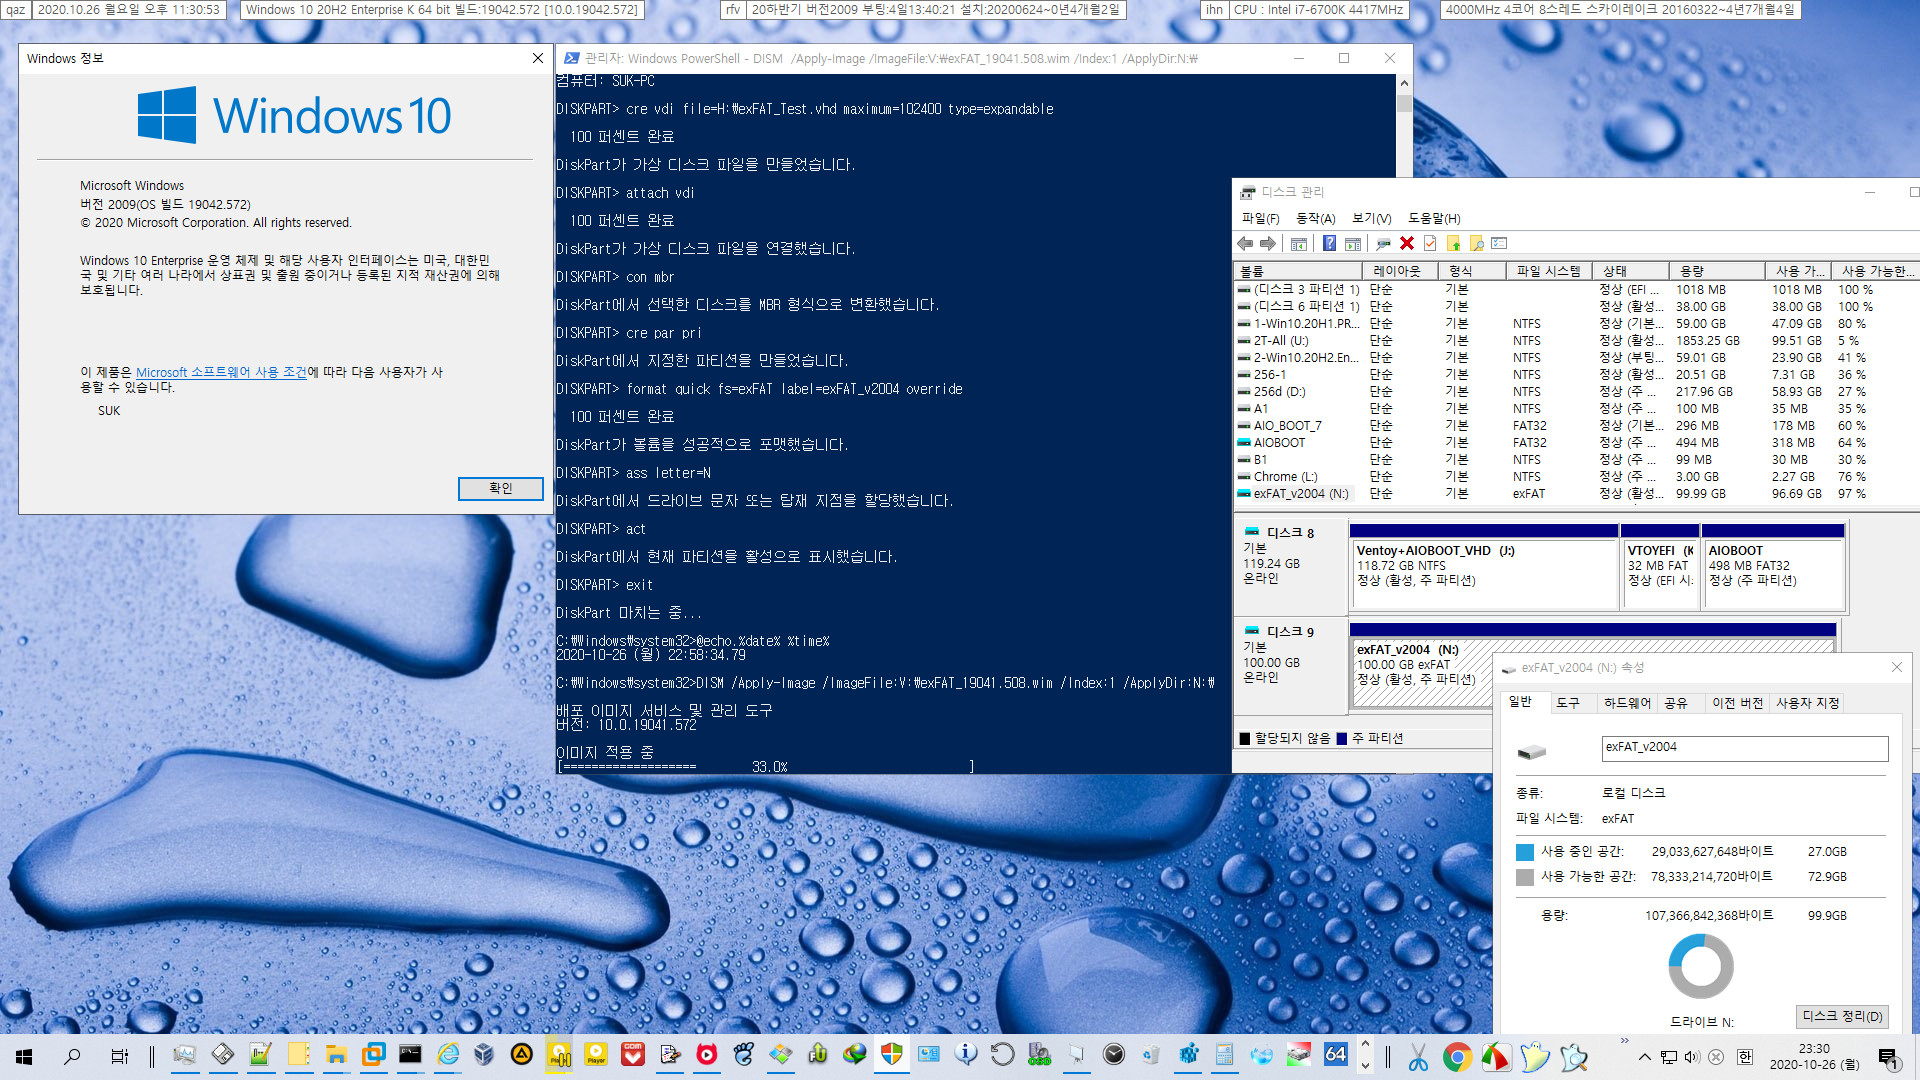 exFAT 포맷으로도 VHD 부팅이 Windows 10 버전 1903부터 된다고 하여 테스트 - 생고생만 하다가 컴퓨터 먹통 2번이나 되고 그만뒀습니다 2020-10-26_233053.jpg